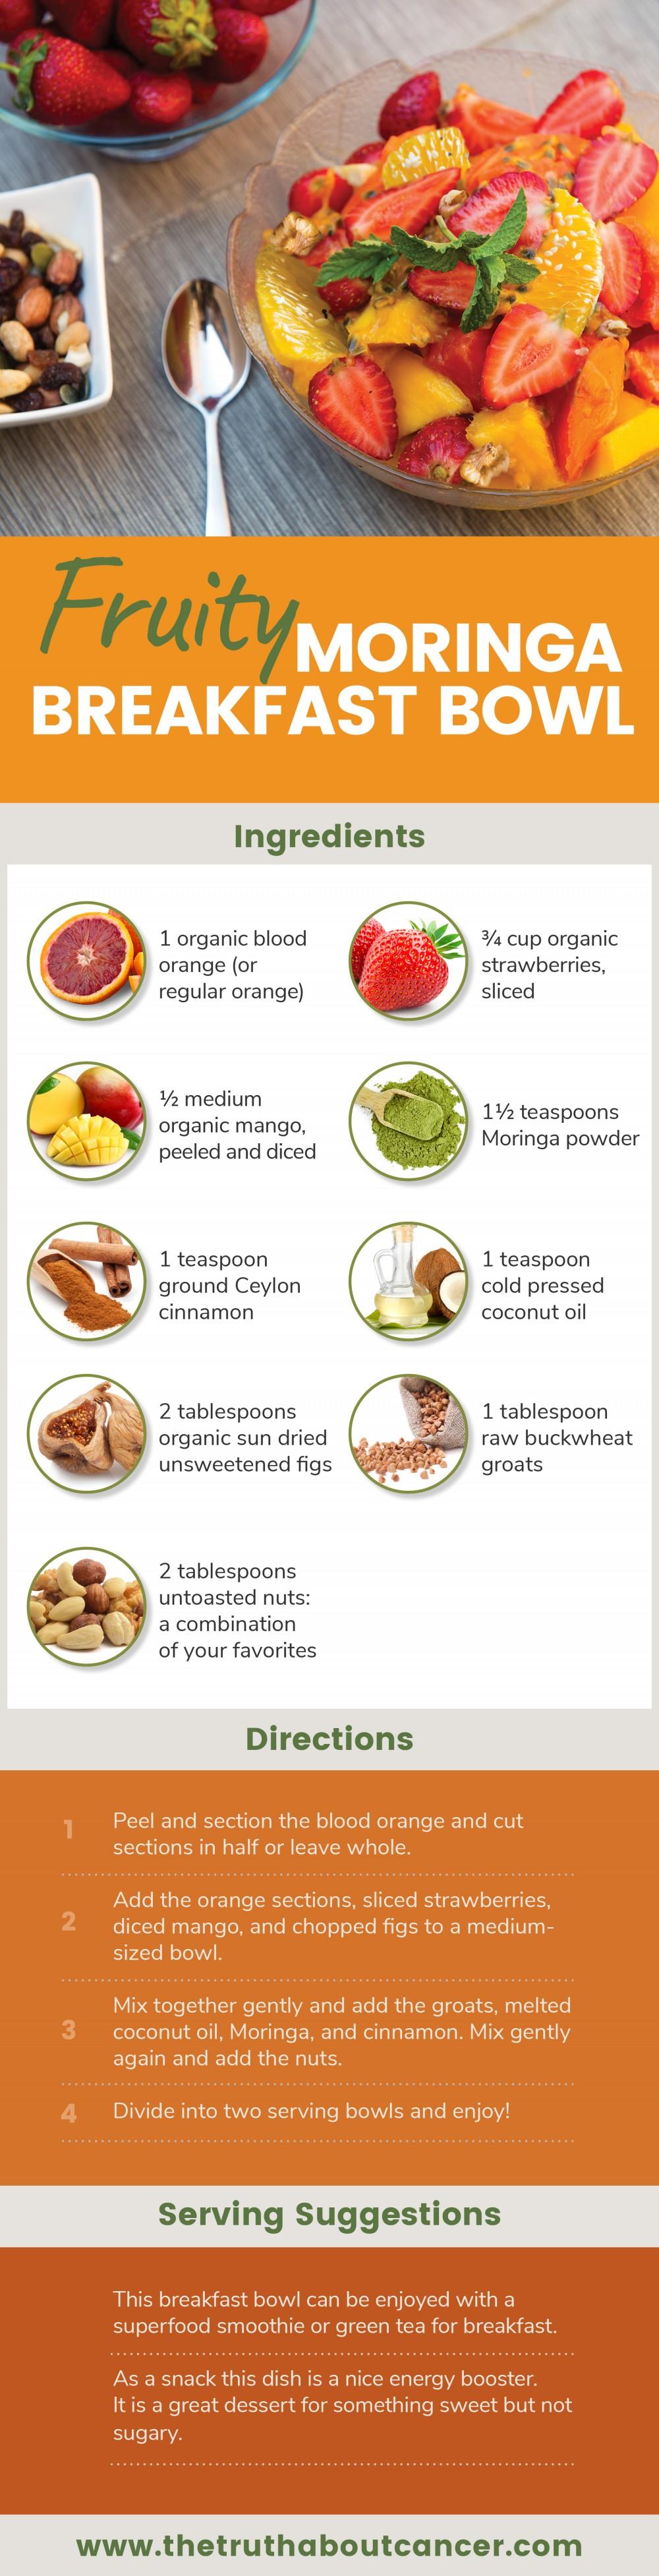 fruity moringa breakfast bowl infographic